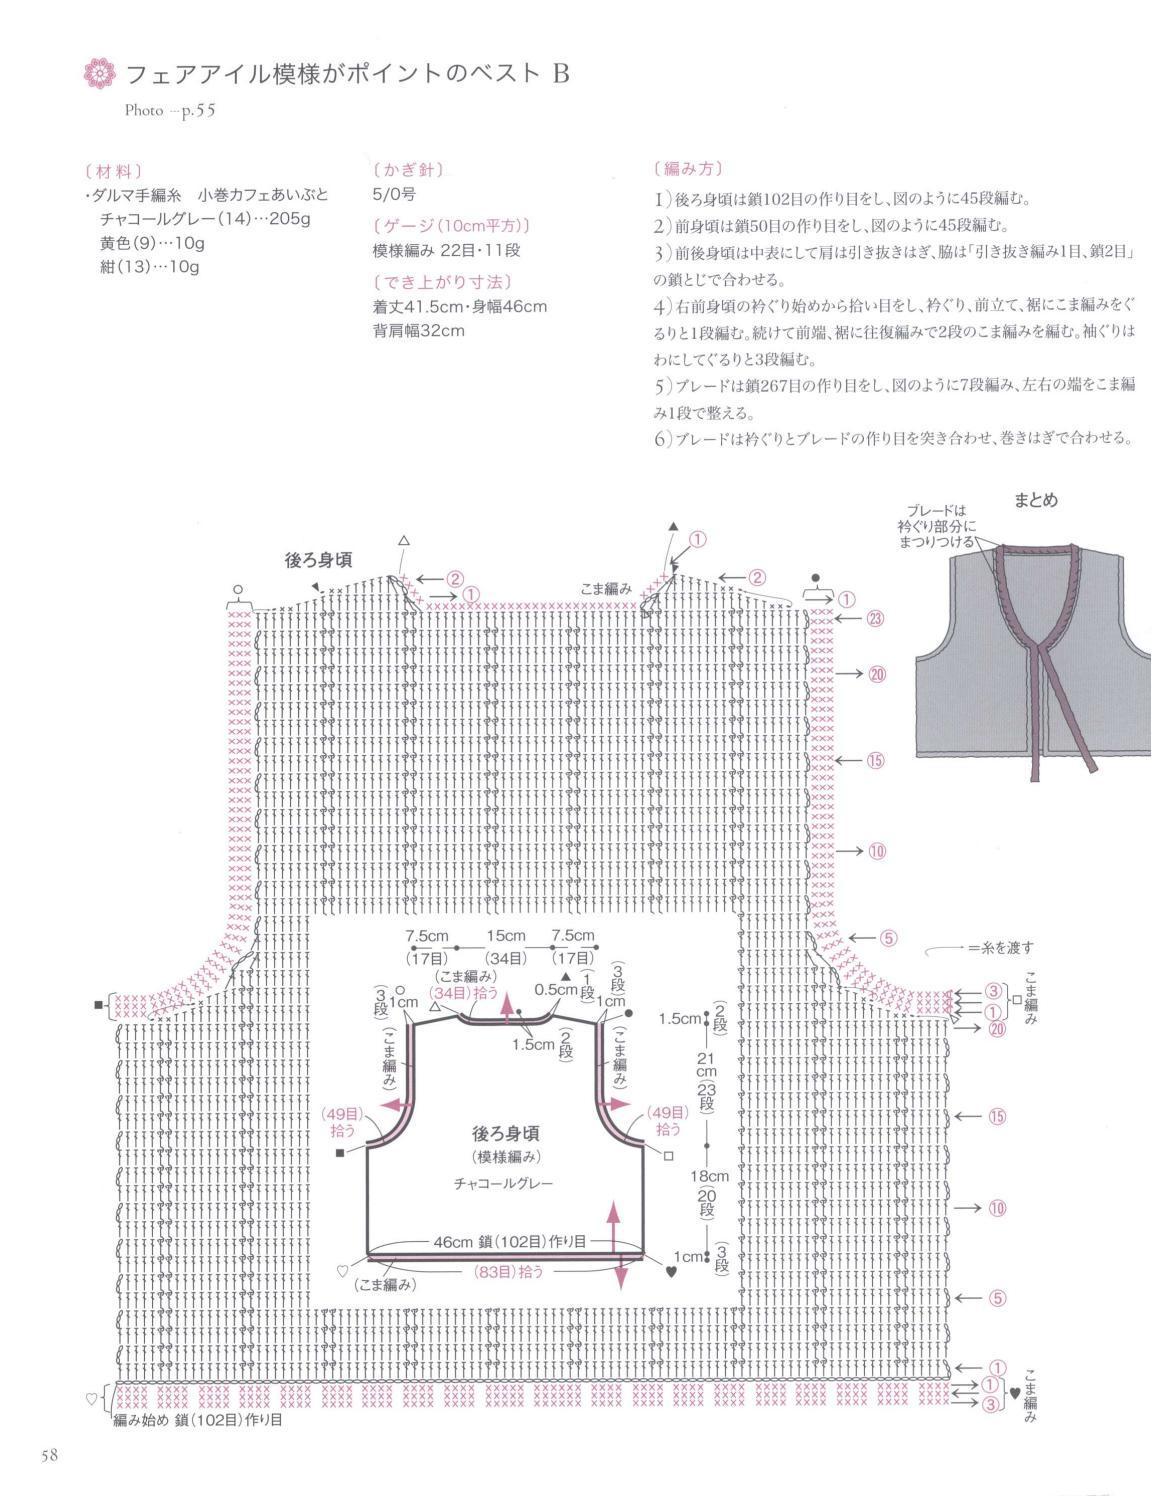 Asahi original crochet best selection 2012 page 58